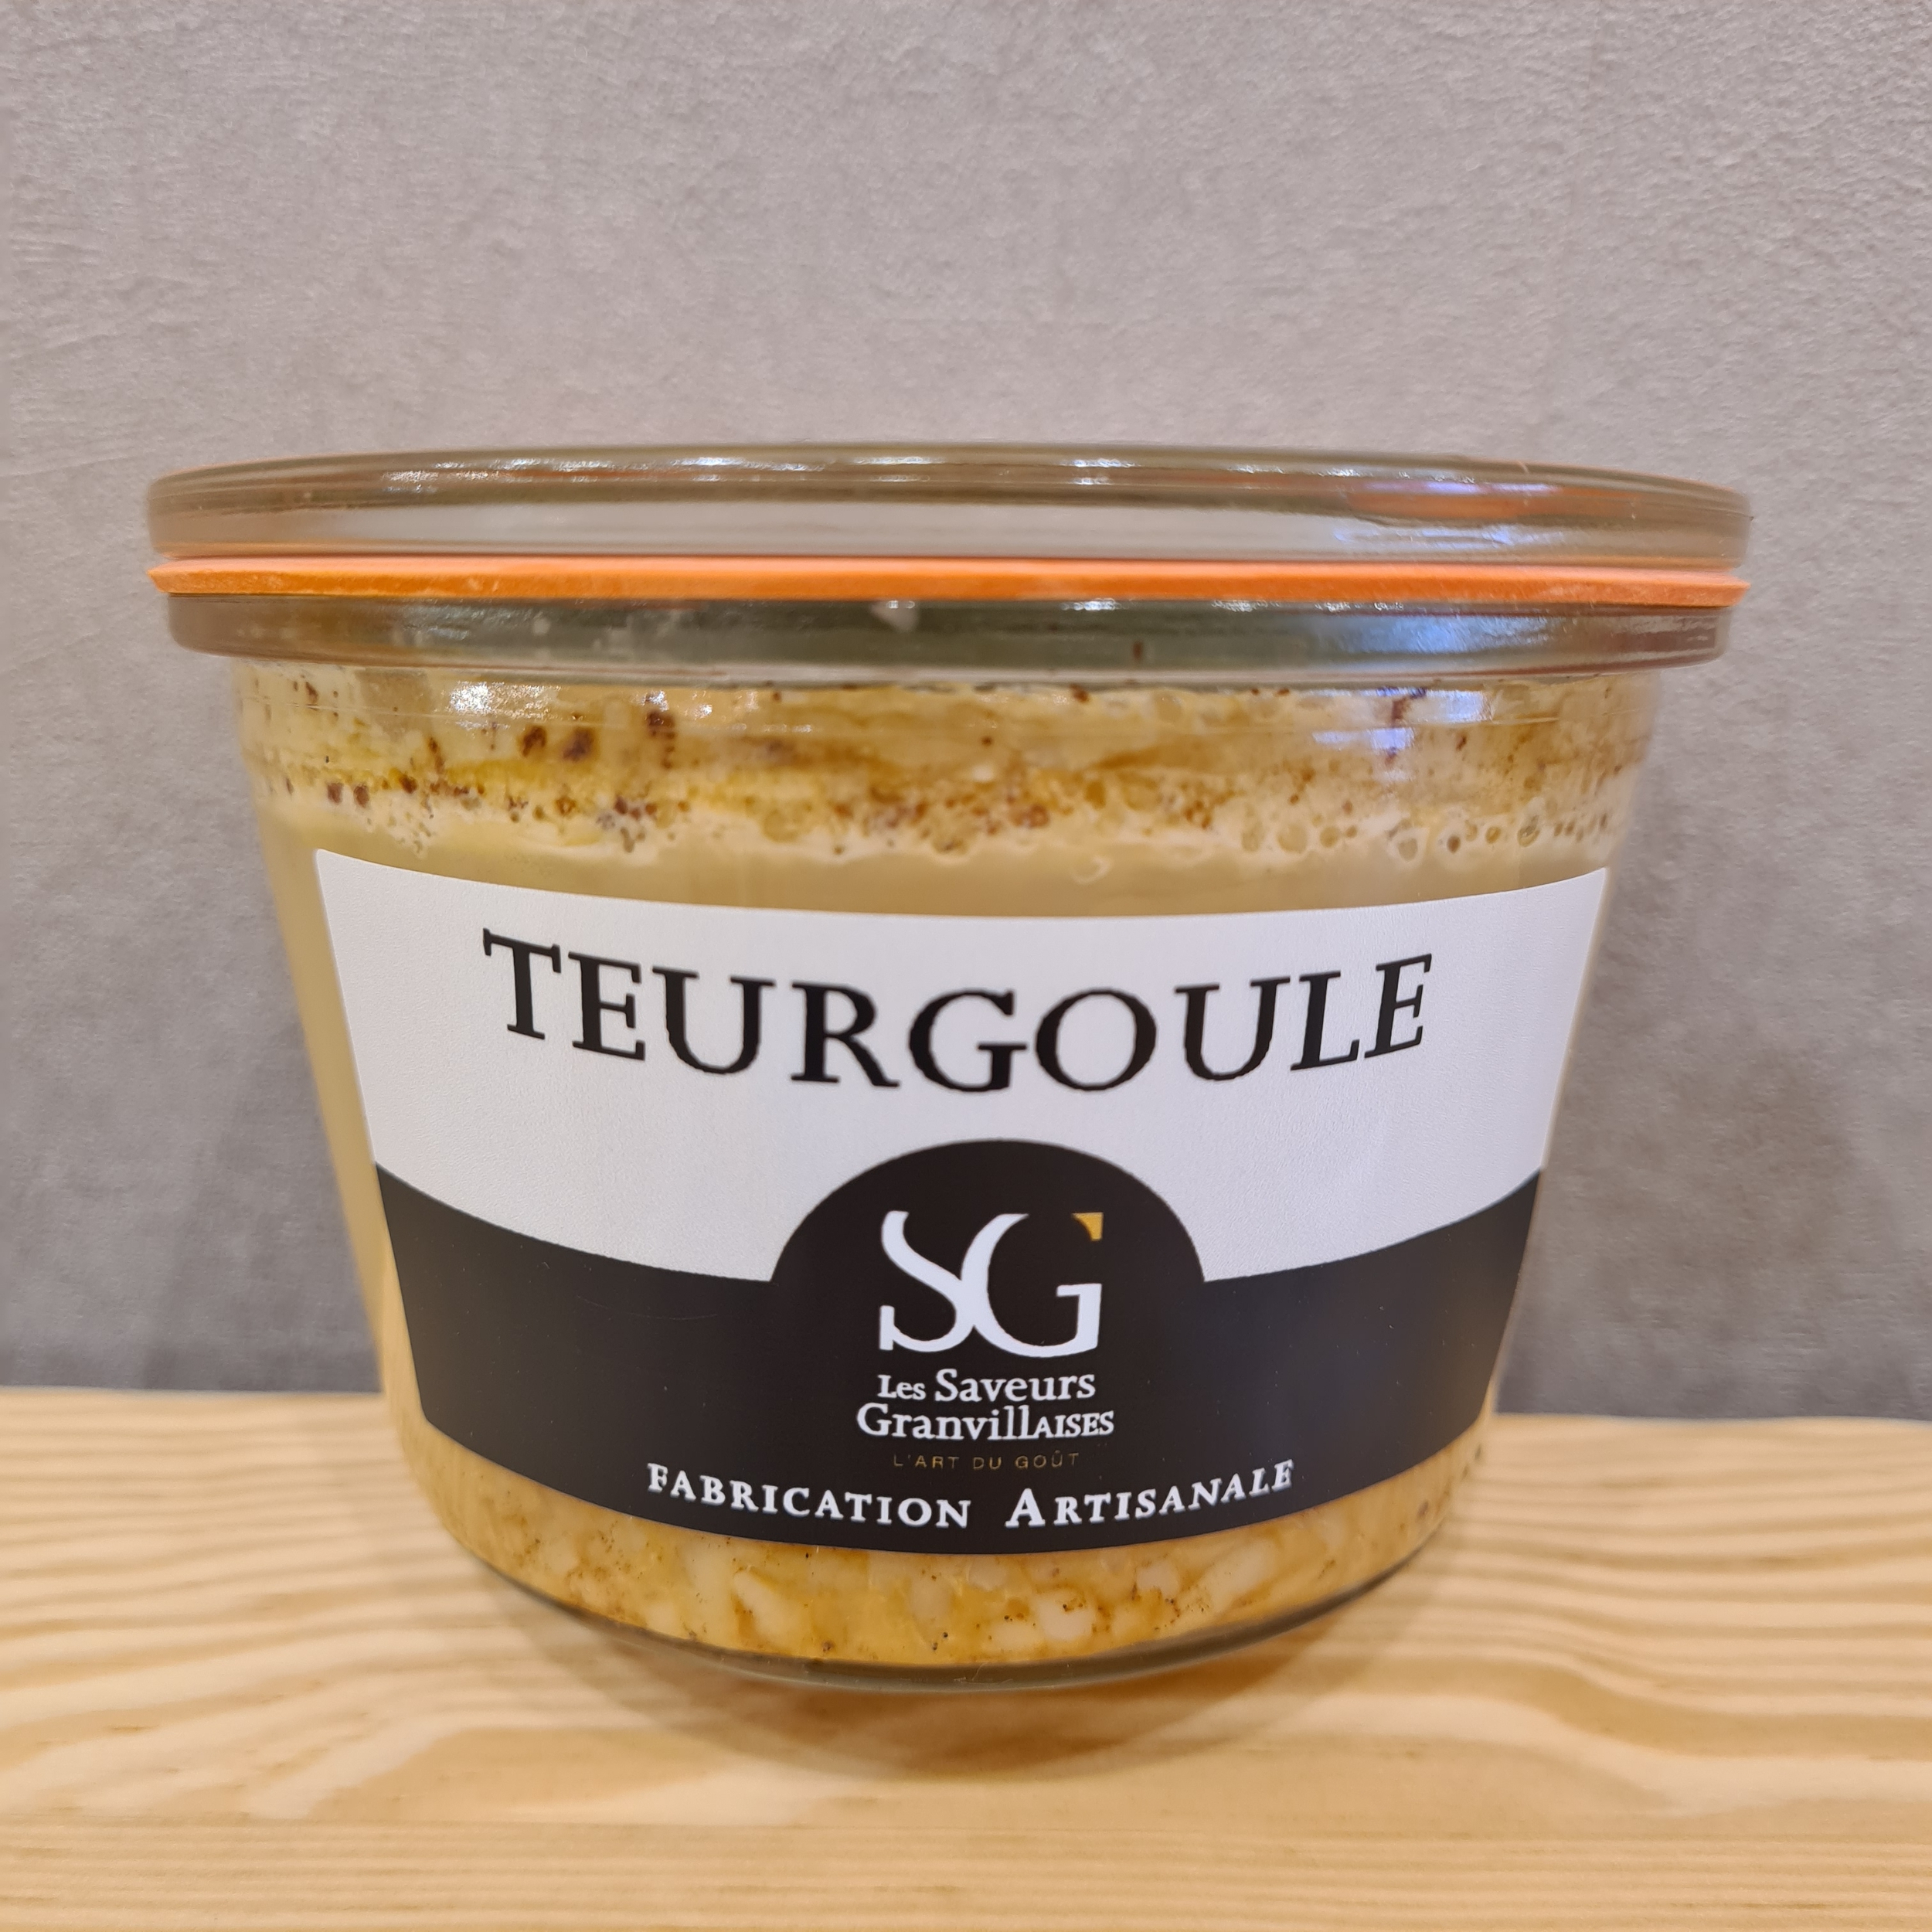 TEURGOULE